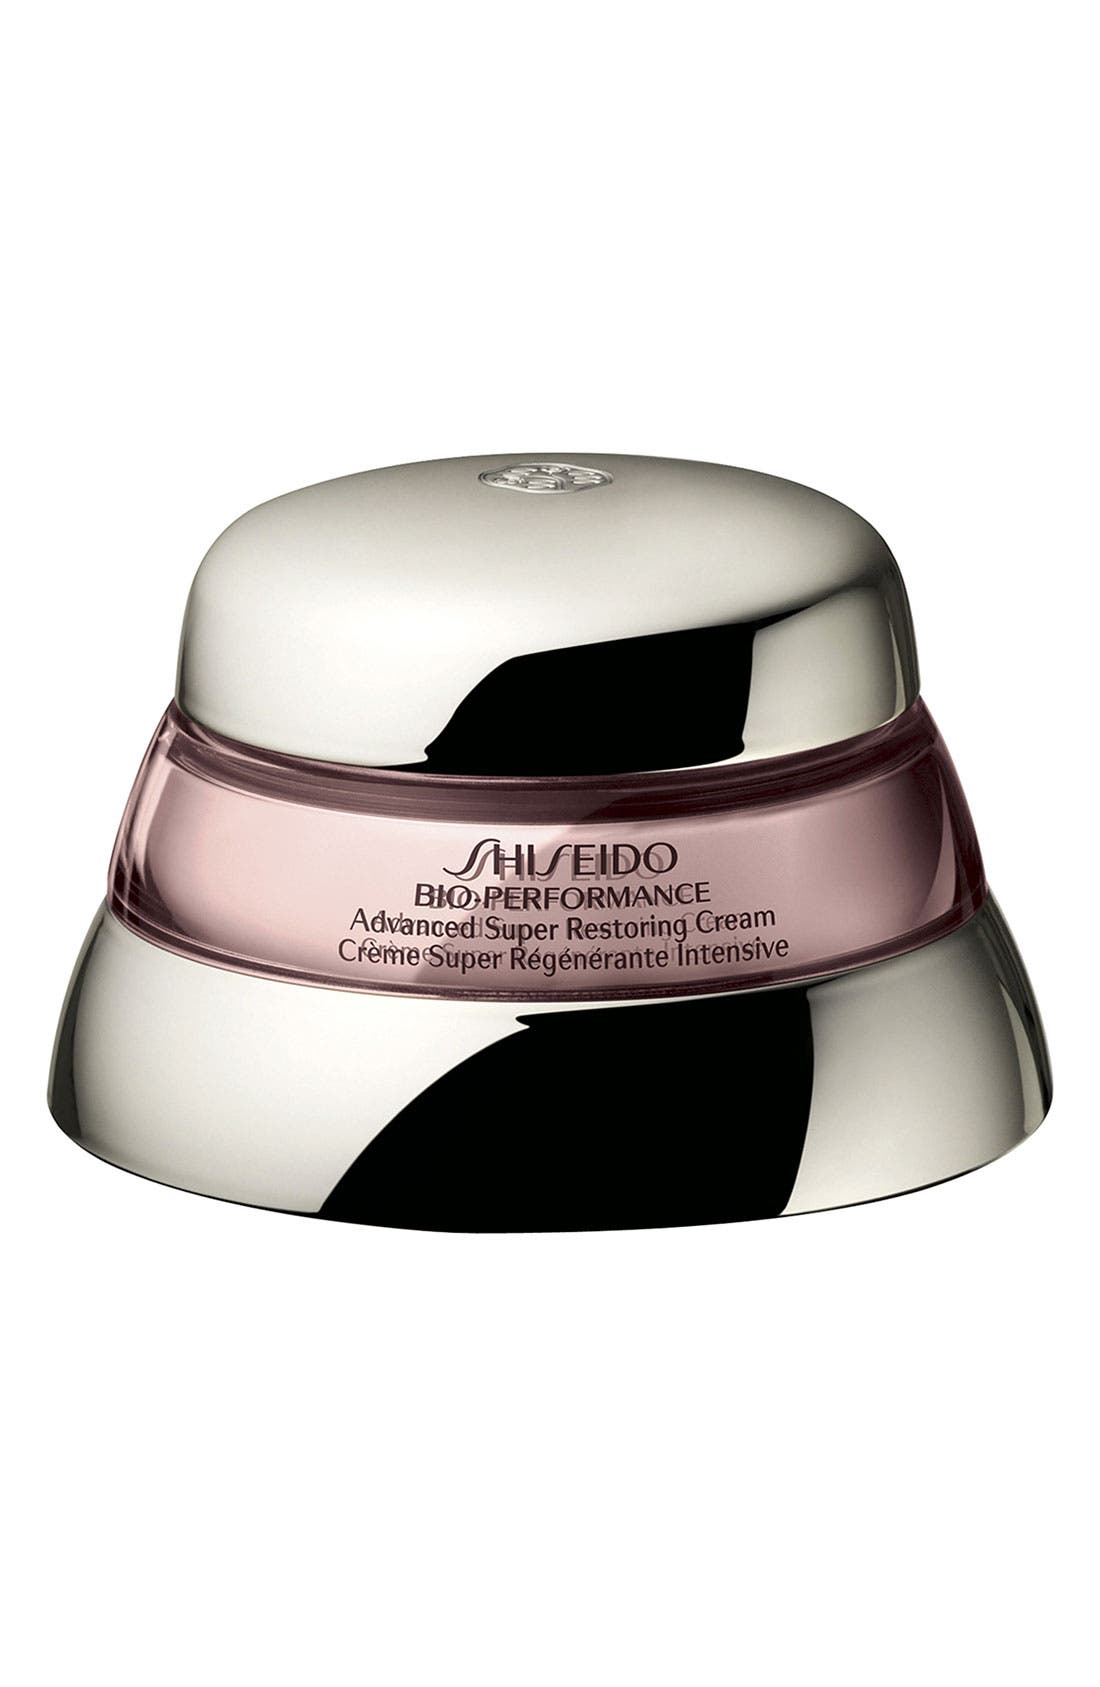 Shiseido 'Bio-Performance' Advanced Super Restoring Cream (2.5 oz.)